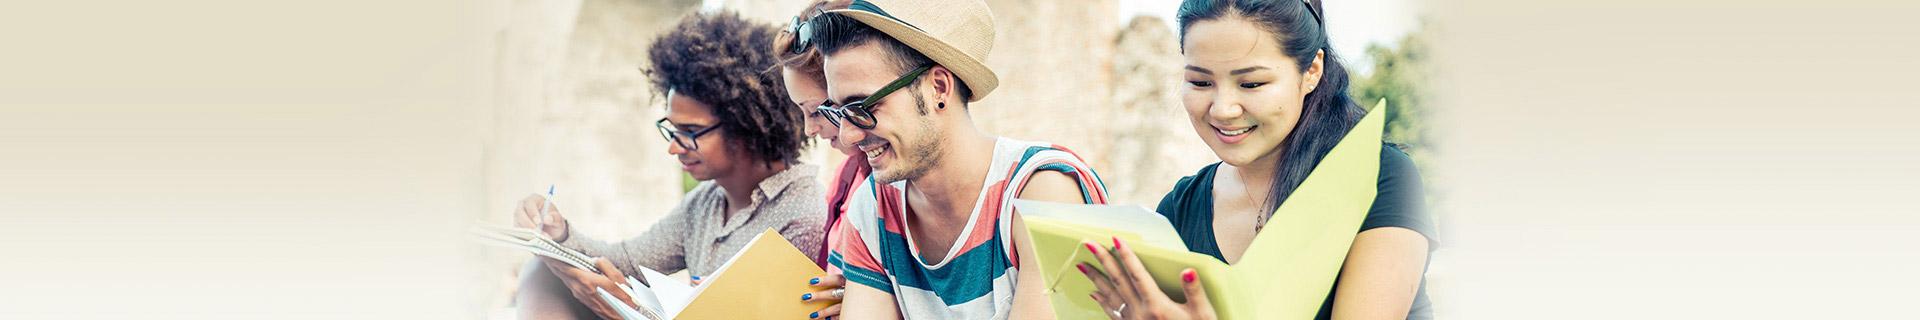 UK University Study Guide for Albania Students